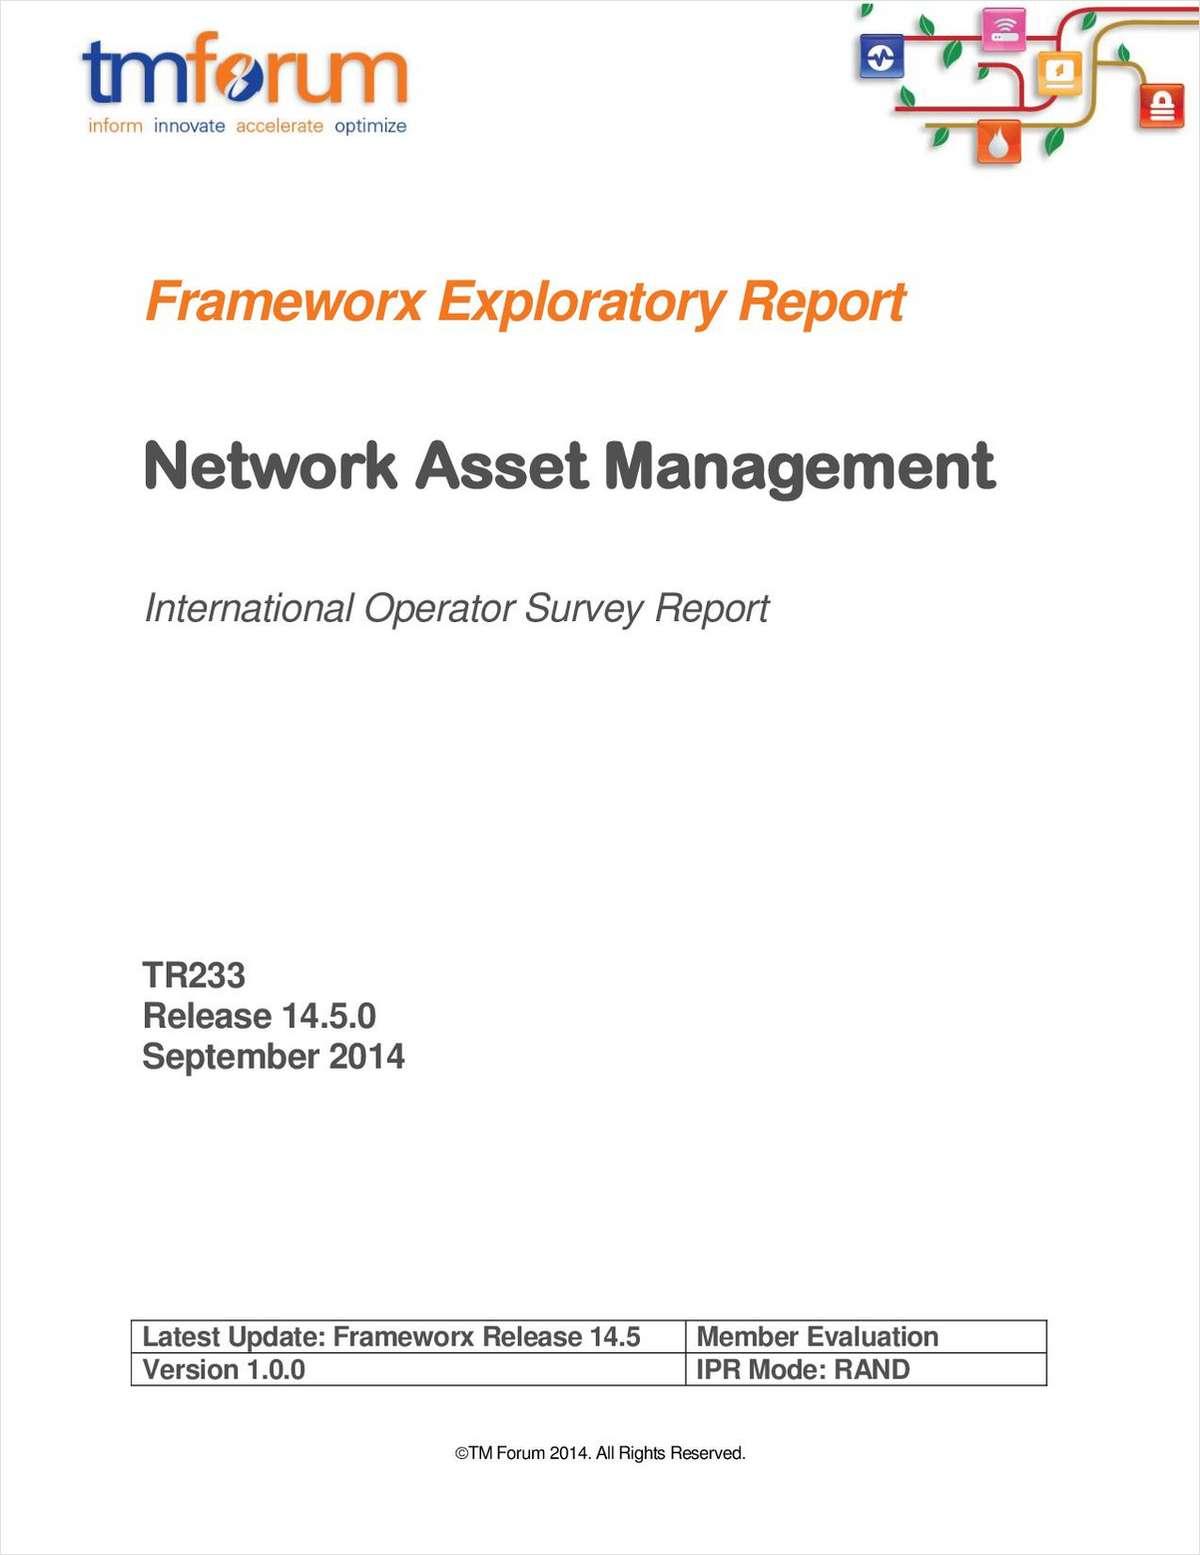 Network Asset Management Survey report 2014